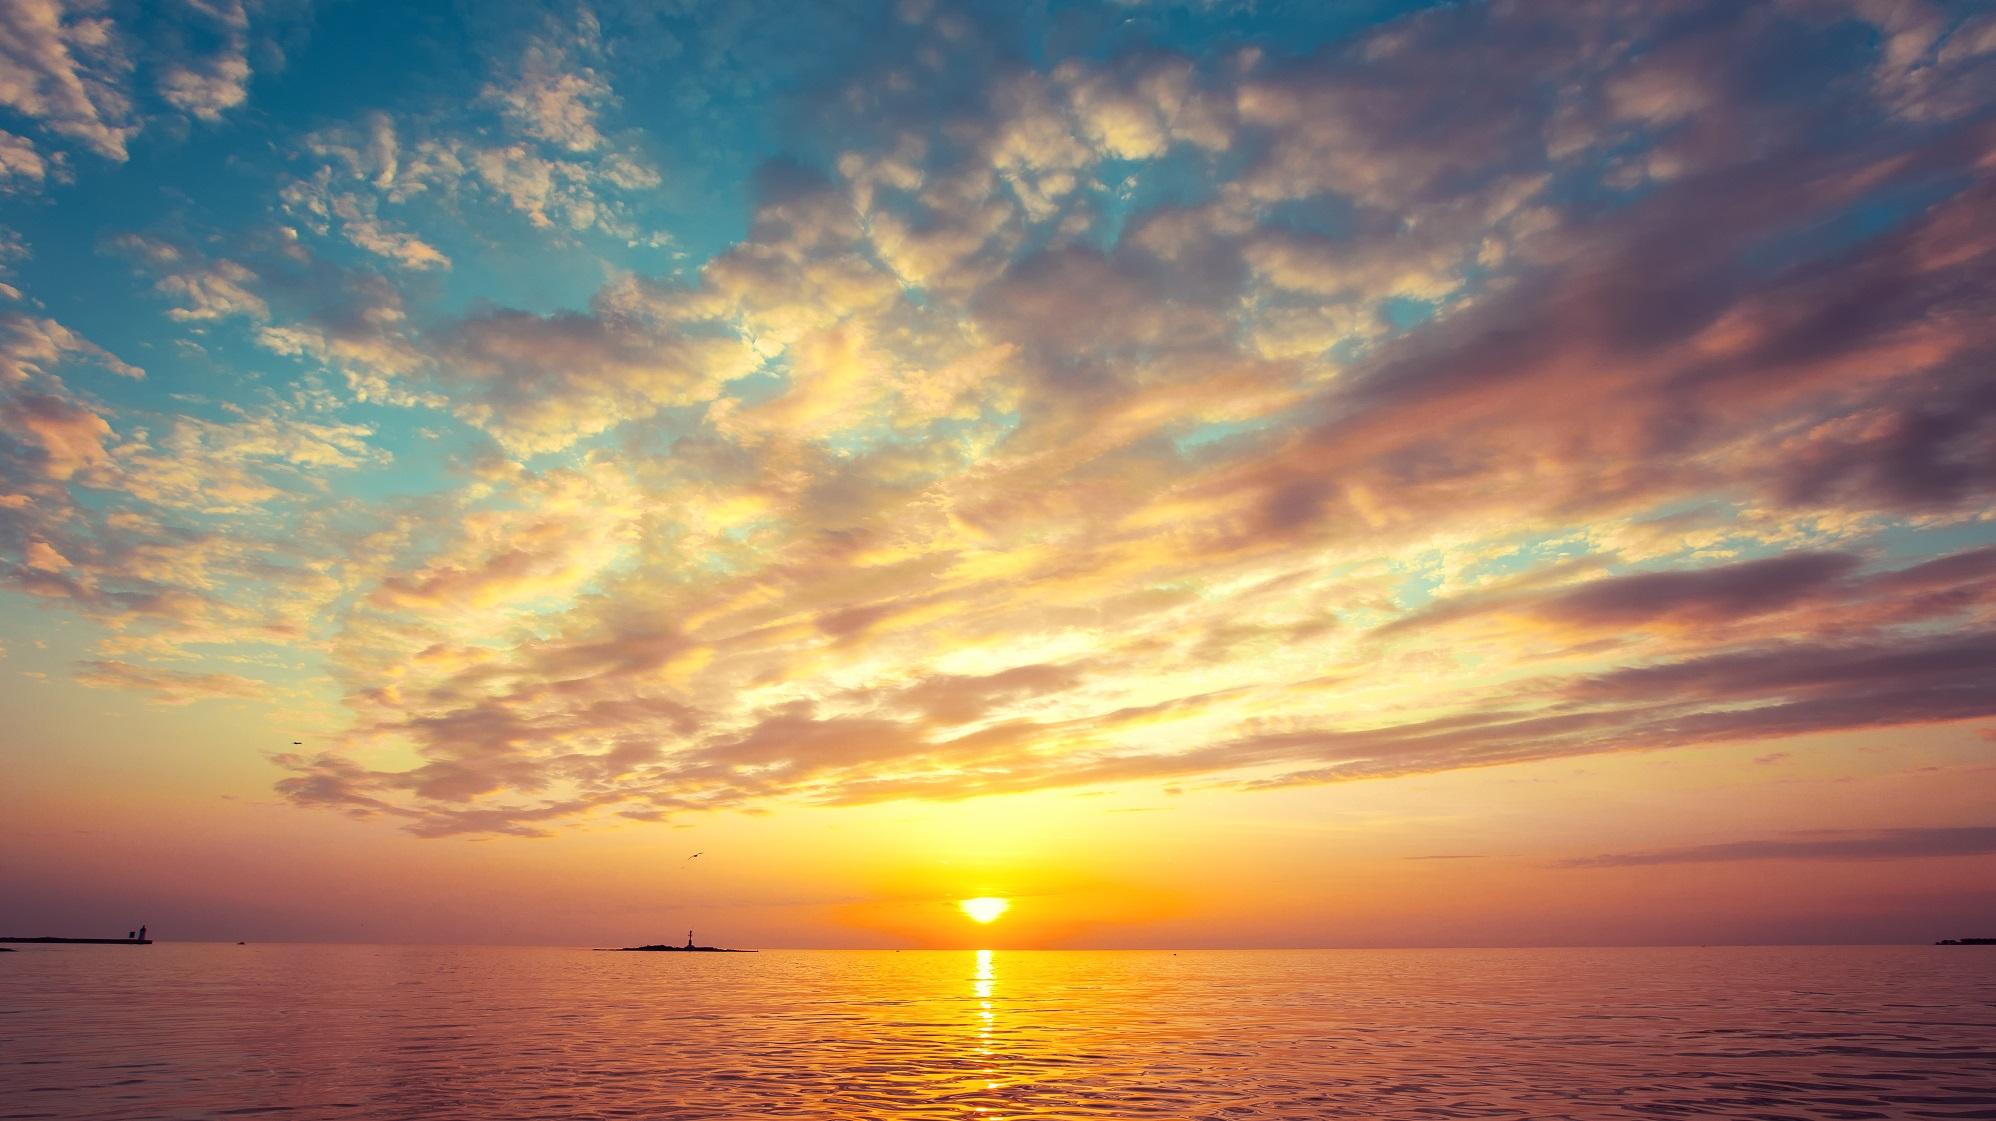 sunset Croatian national tourist board and ivo biocina